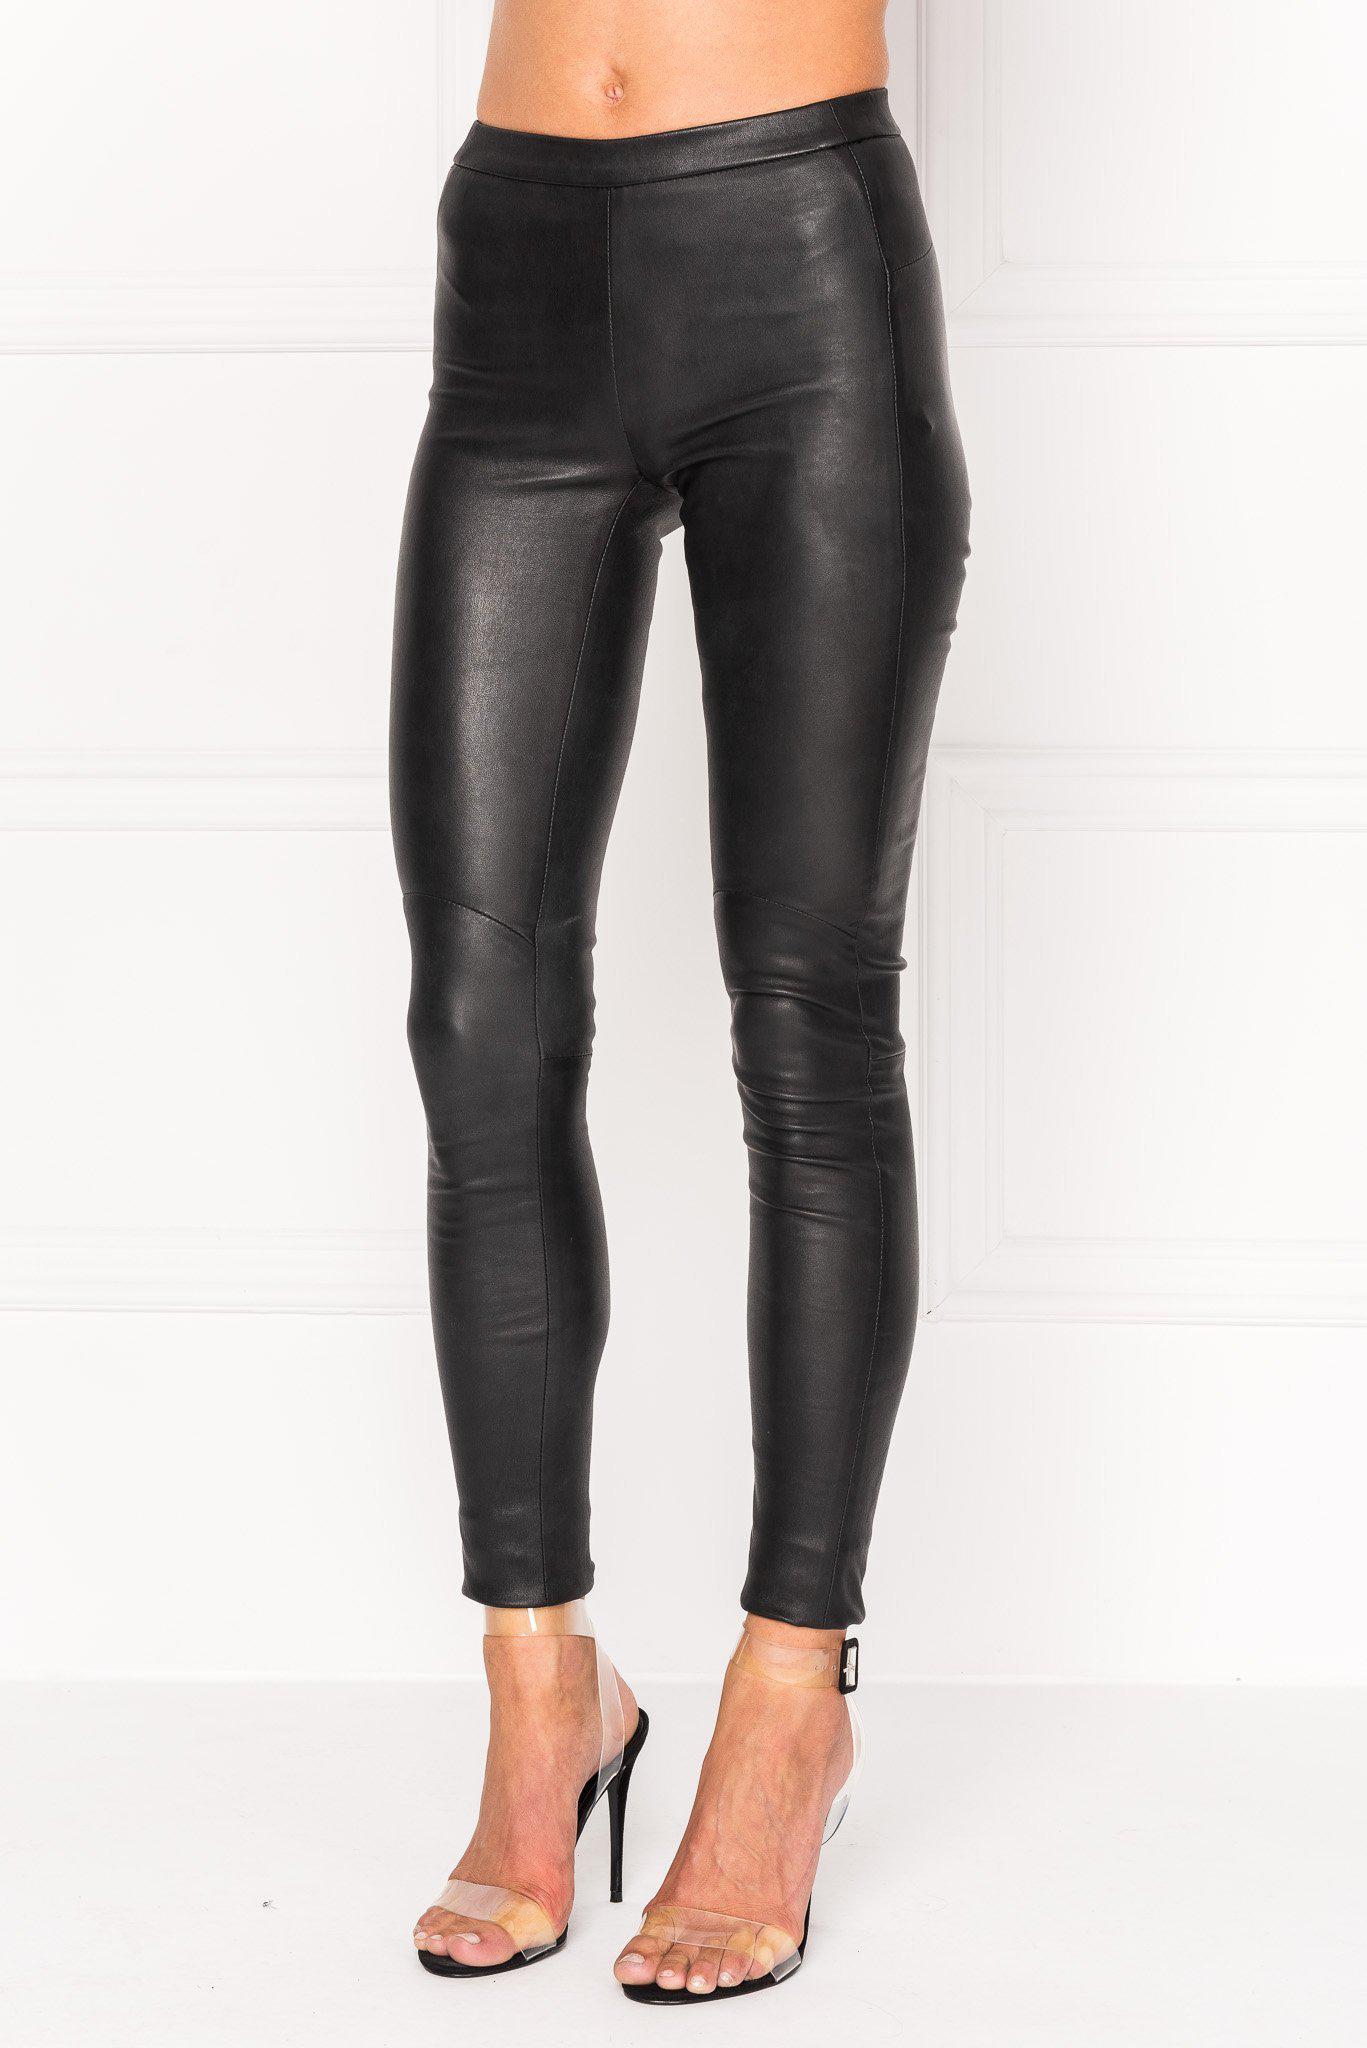 1f2d8d4b20f050 Lamarque - Black Kelly Stretch Leather Legging - Lyst. View fullscreen